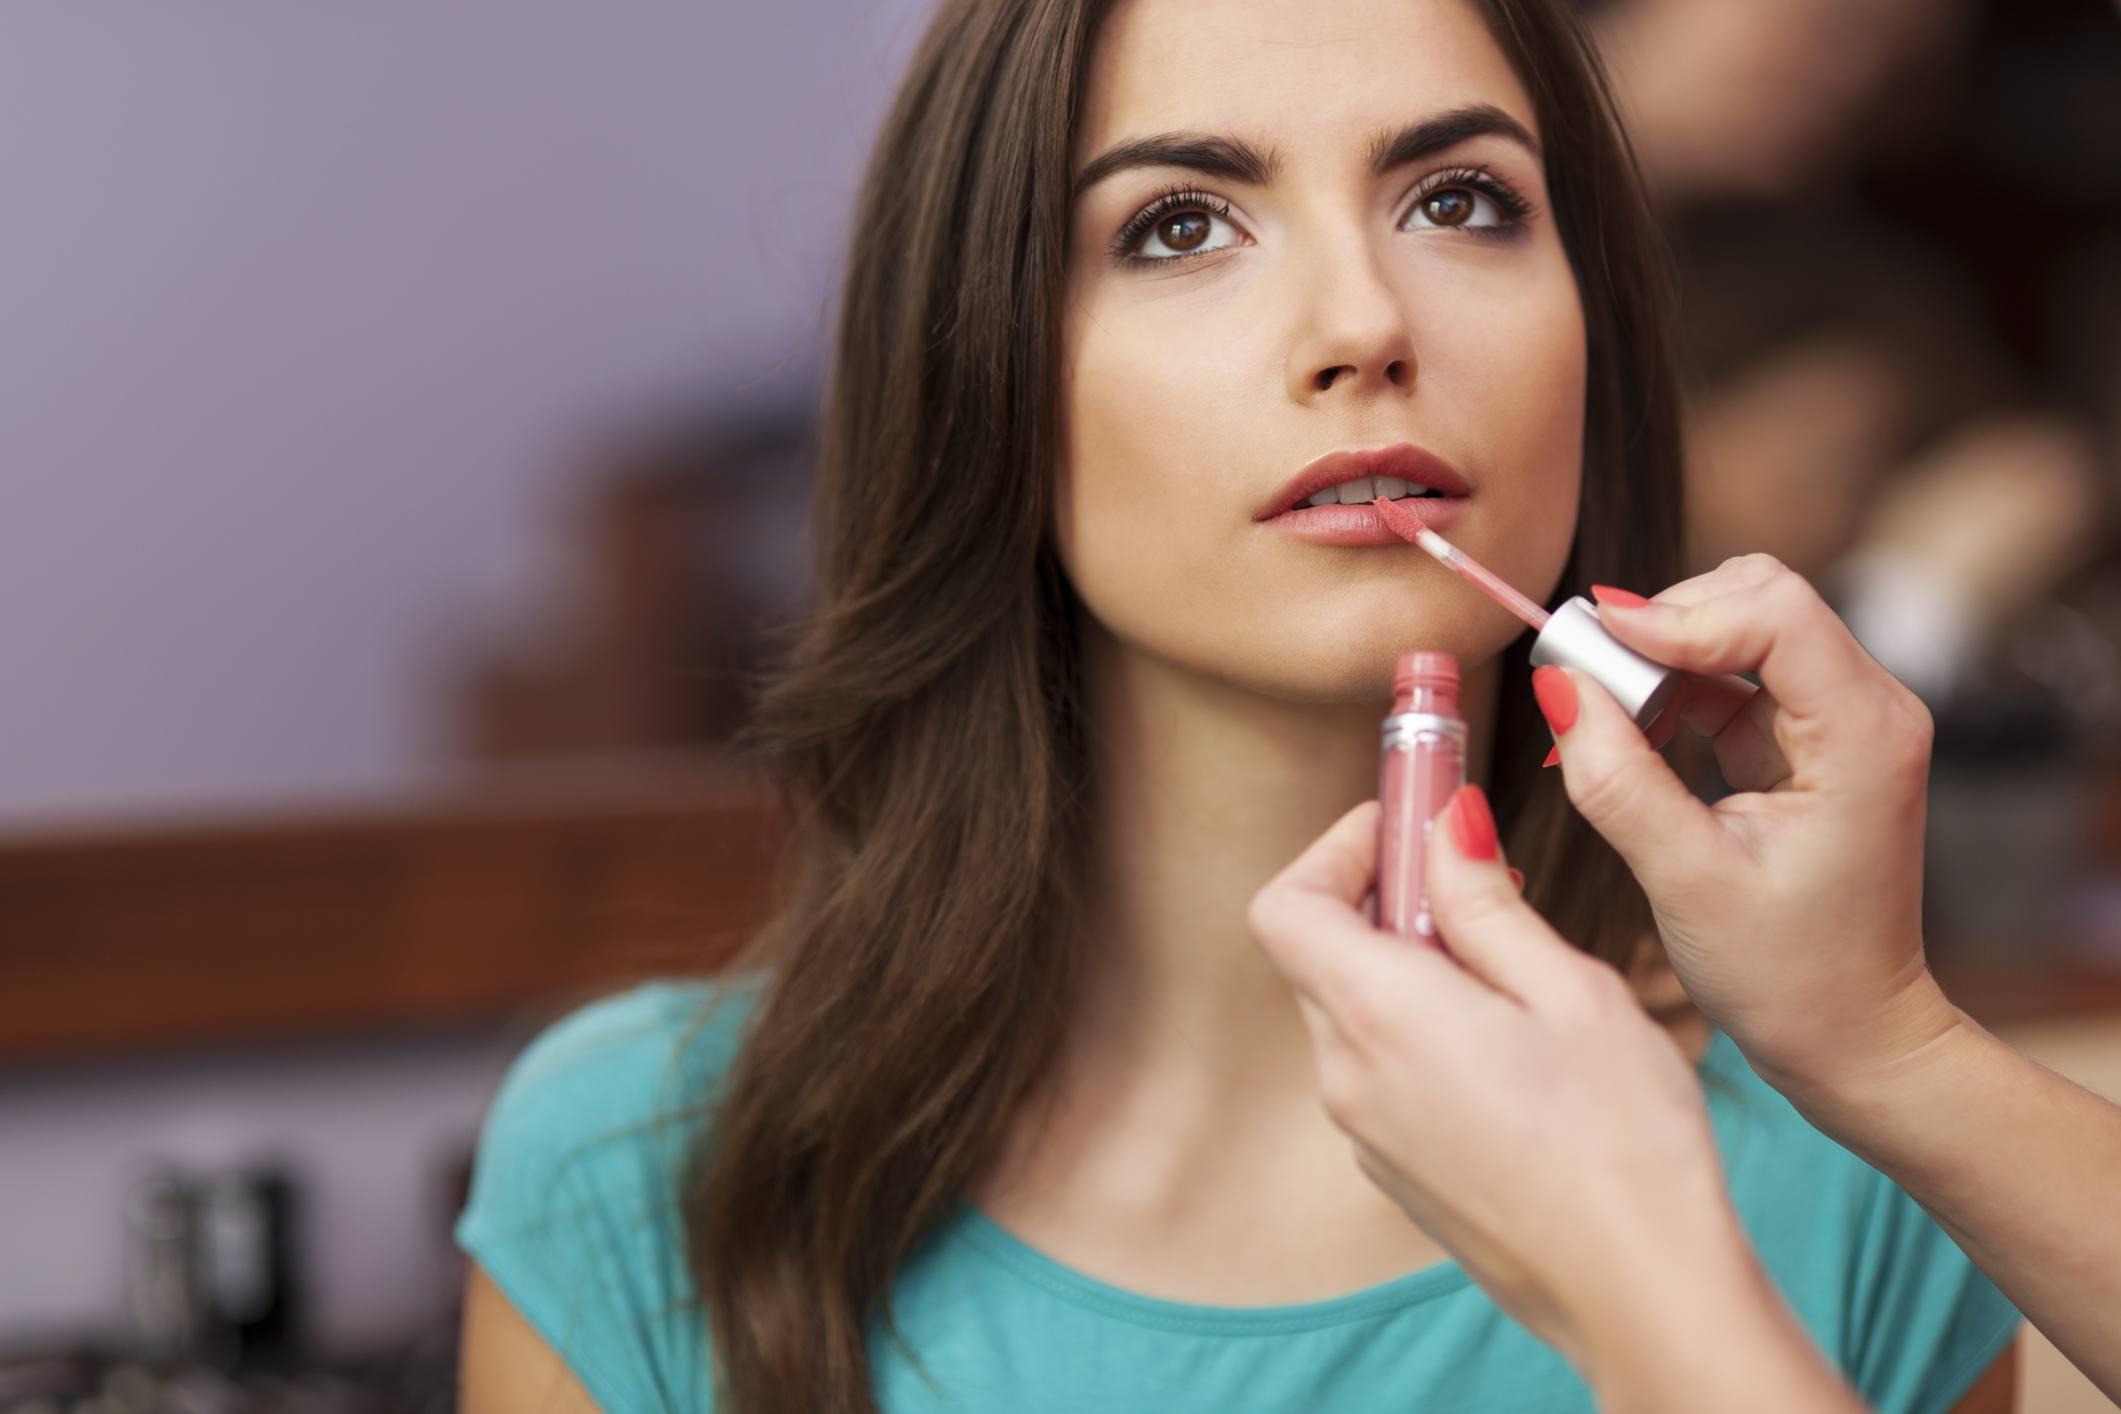 Applying lip-gloss to the lips